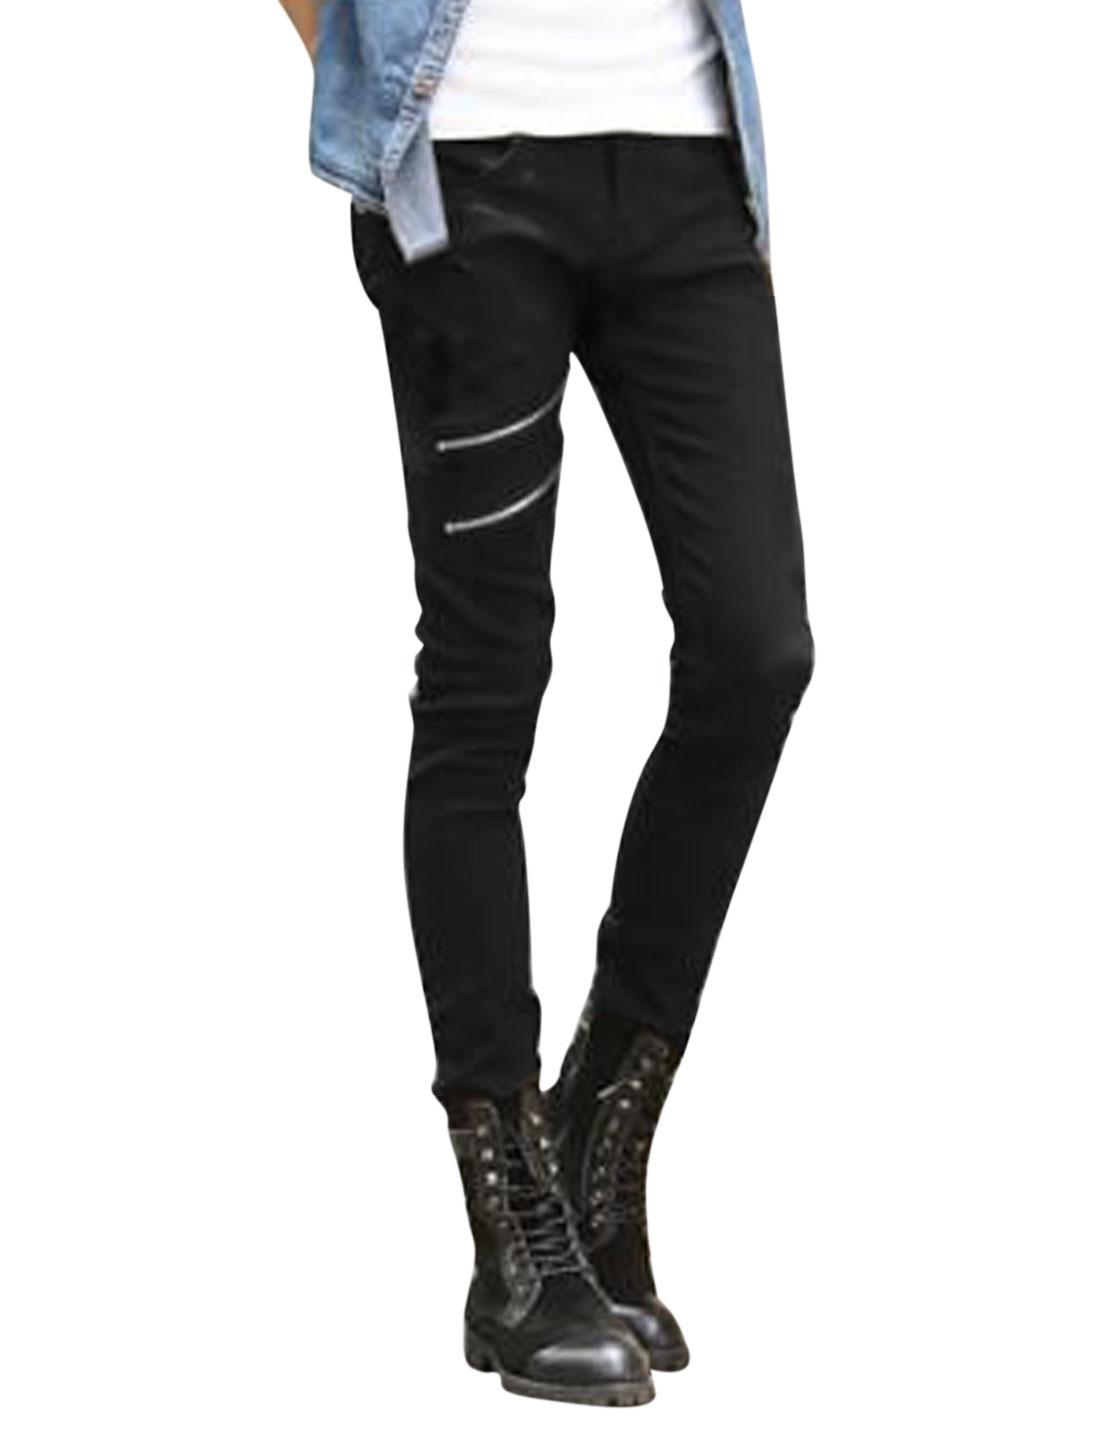 Men Mid Rise Zip Fly Zipper Decor Skinny Casual Pants Black W30